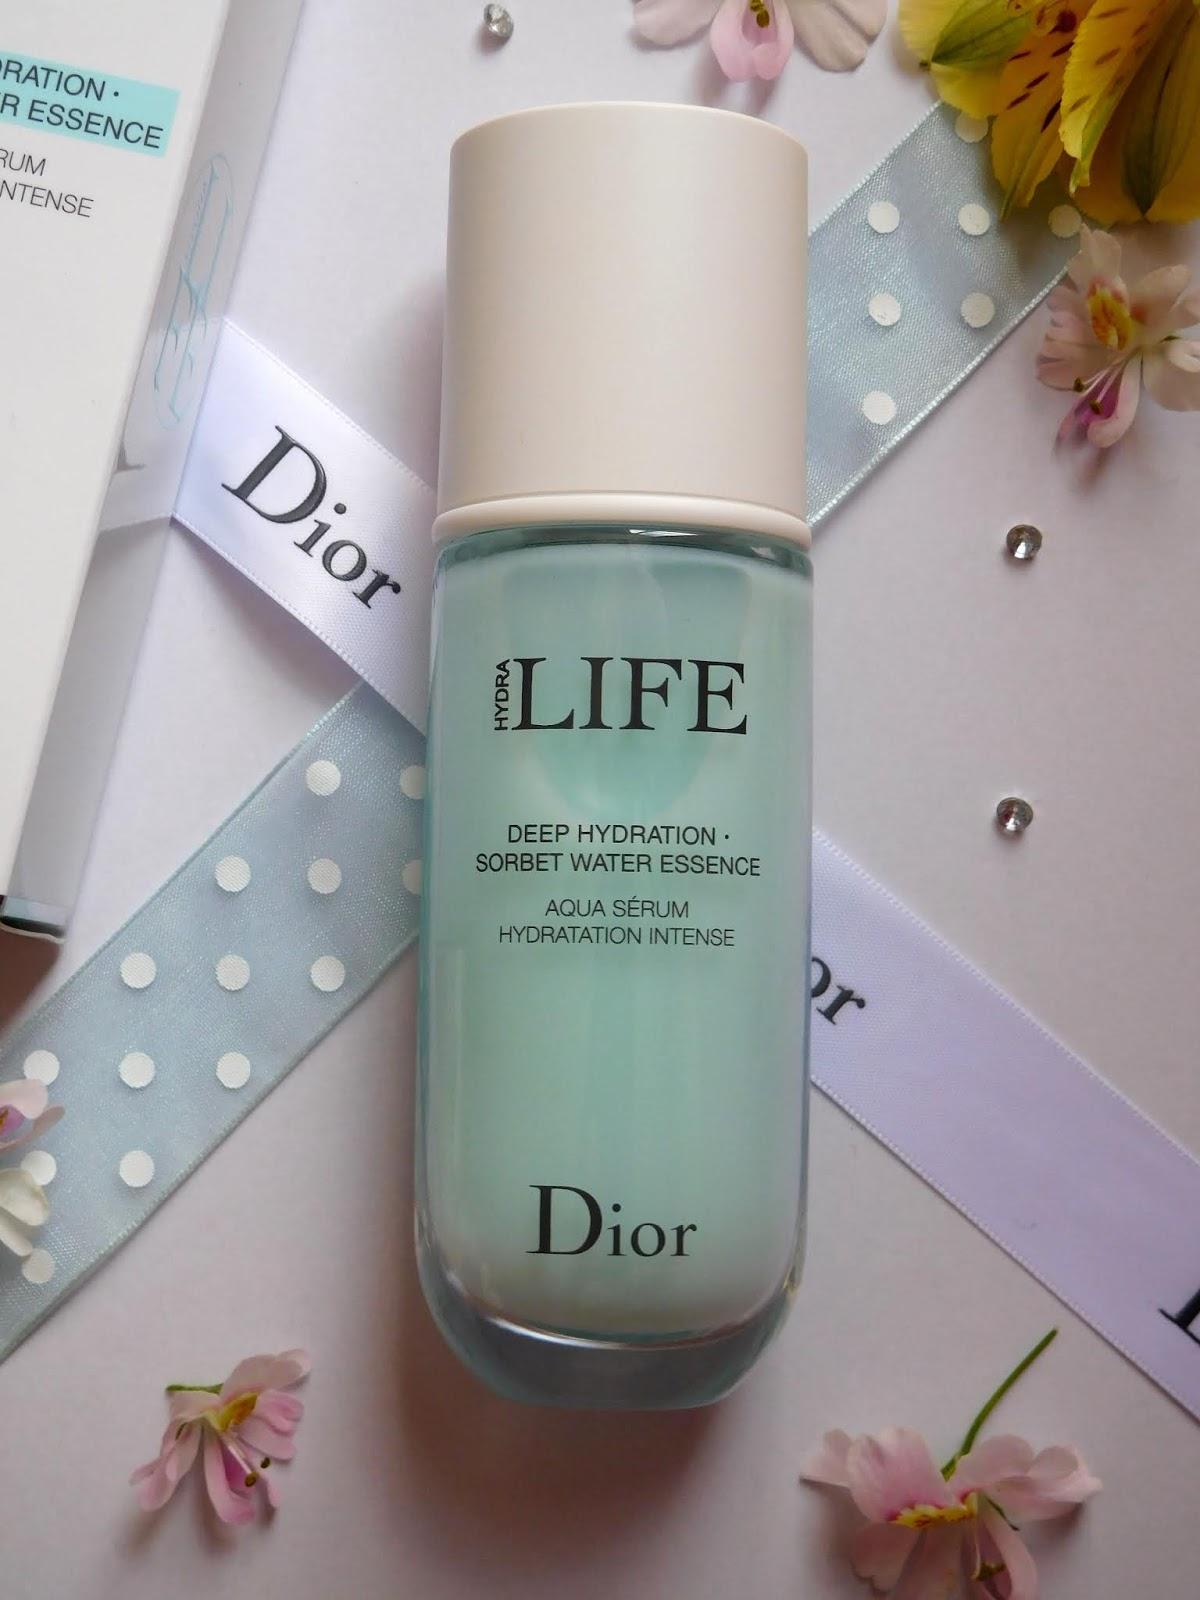 Hydra Life Deep Hydration Sorbet Water Essence by Dior #4